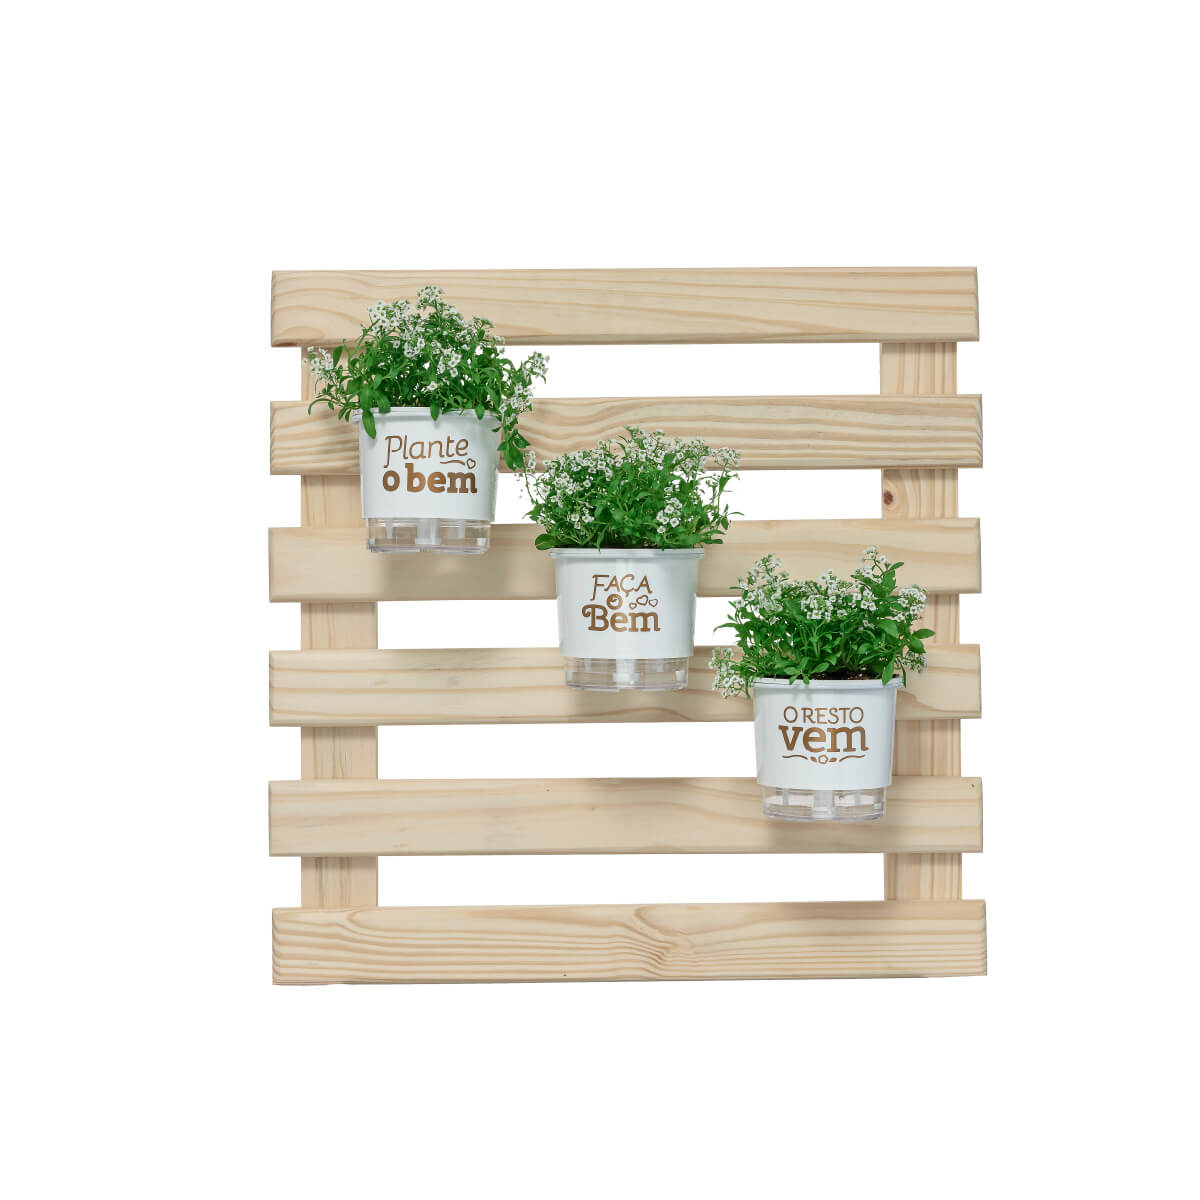 Mini Jardim Vertical 60cm x 60cm Plante o Bem Branco  - Loja Raiz